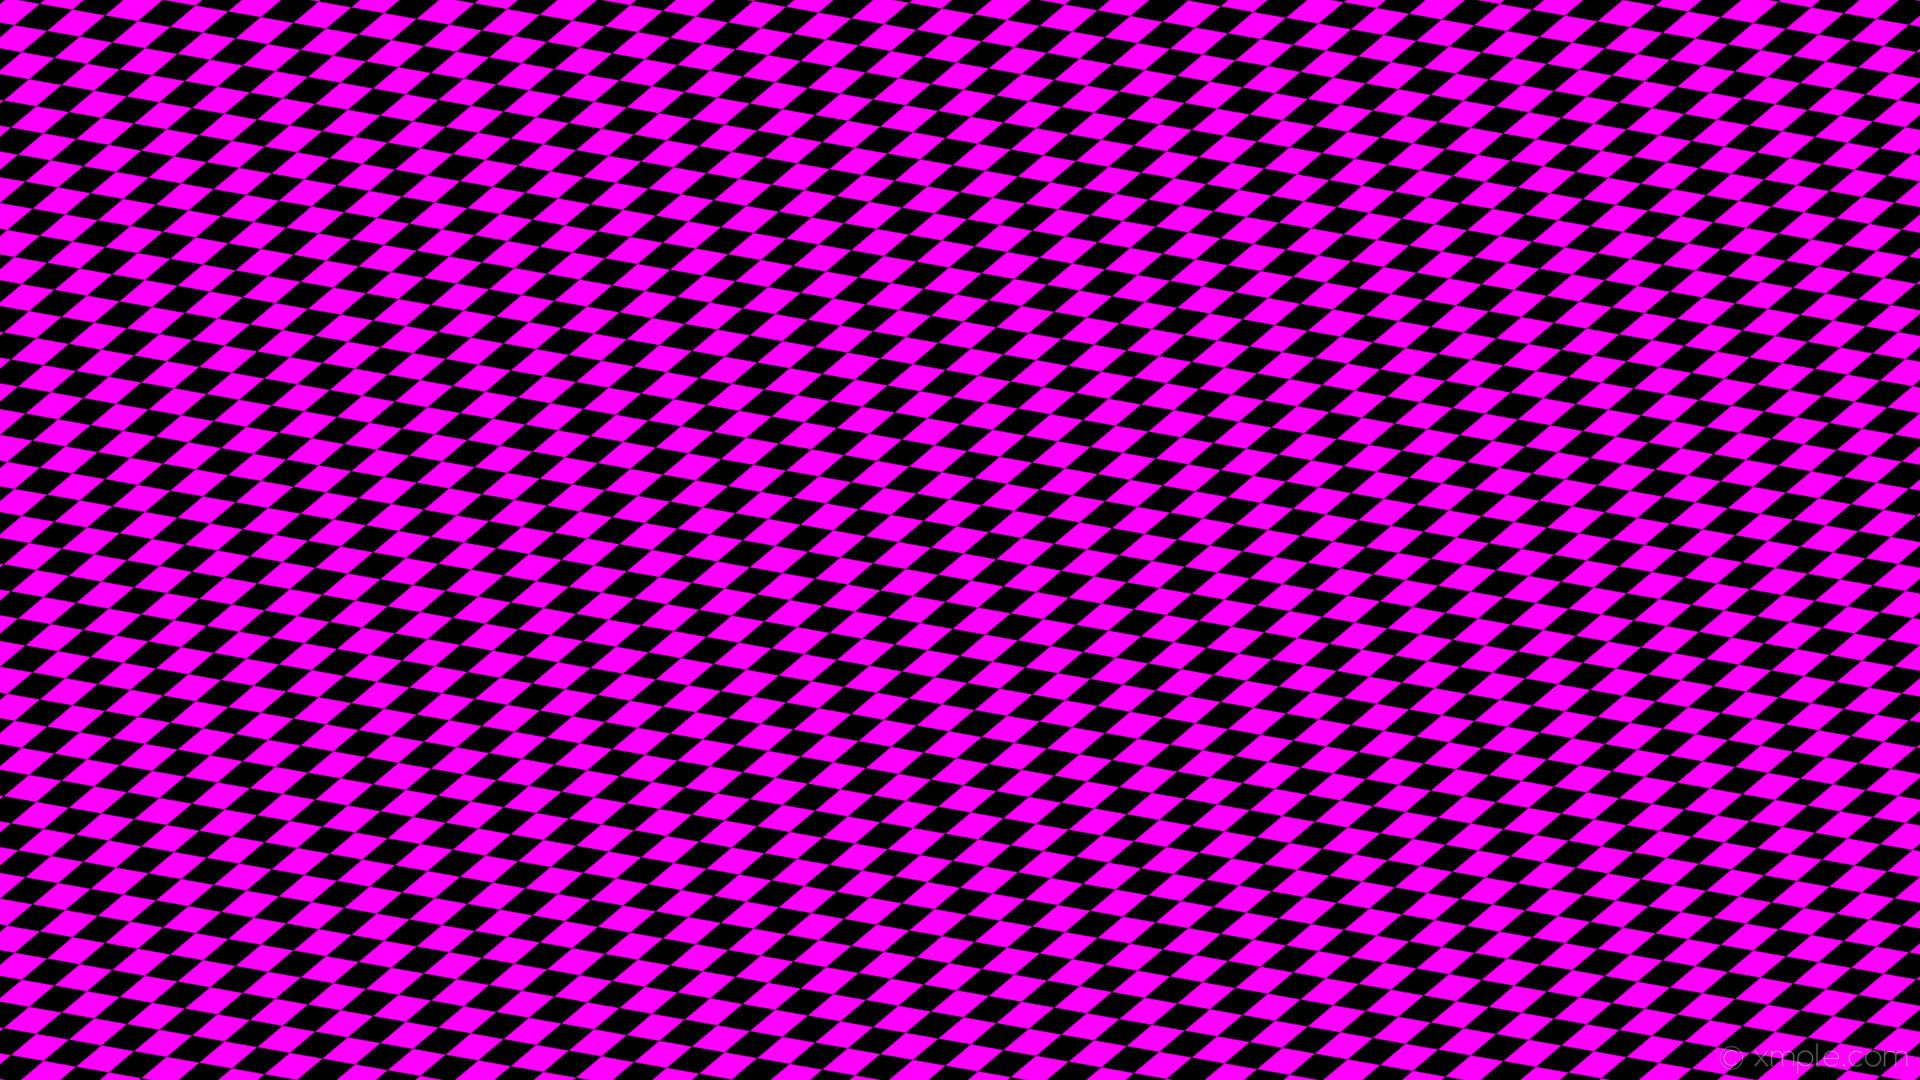 wallpaper purple diamond rhombus black lozenge magenta #ff00ff #000000 15°  60px 28px